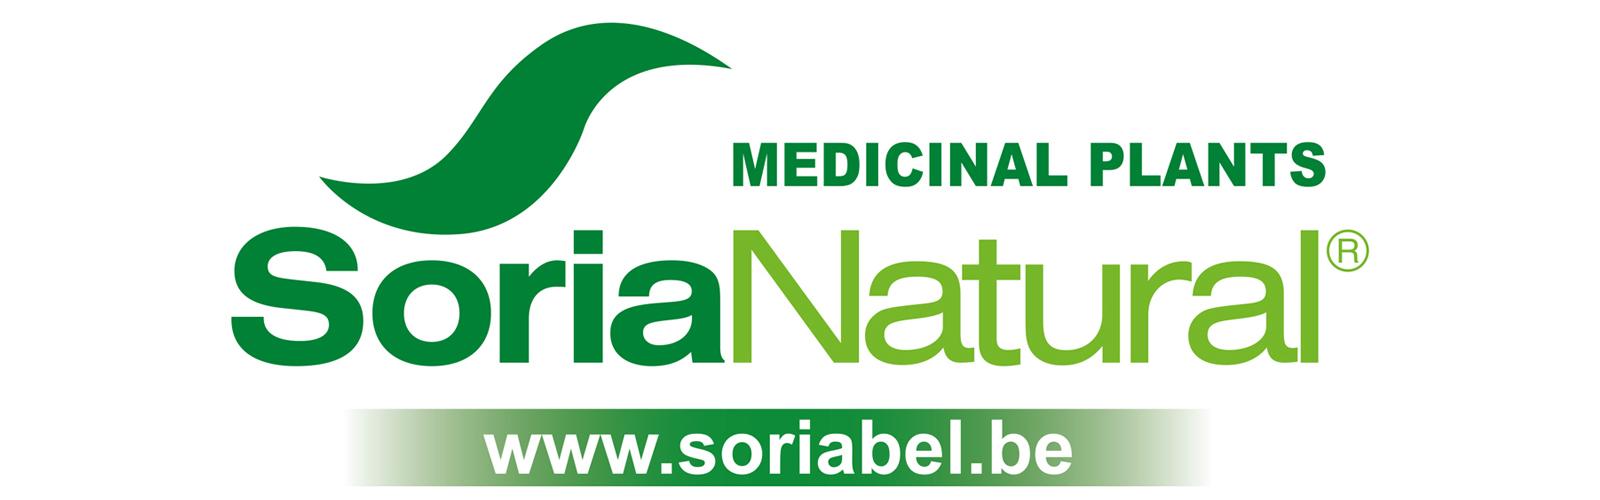 """""Soria Natural"